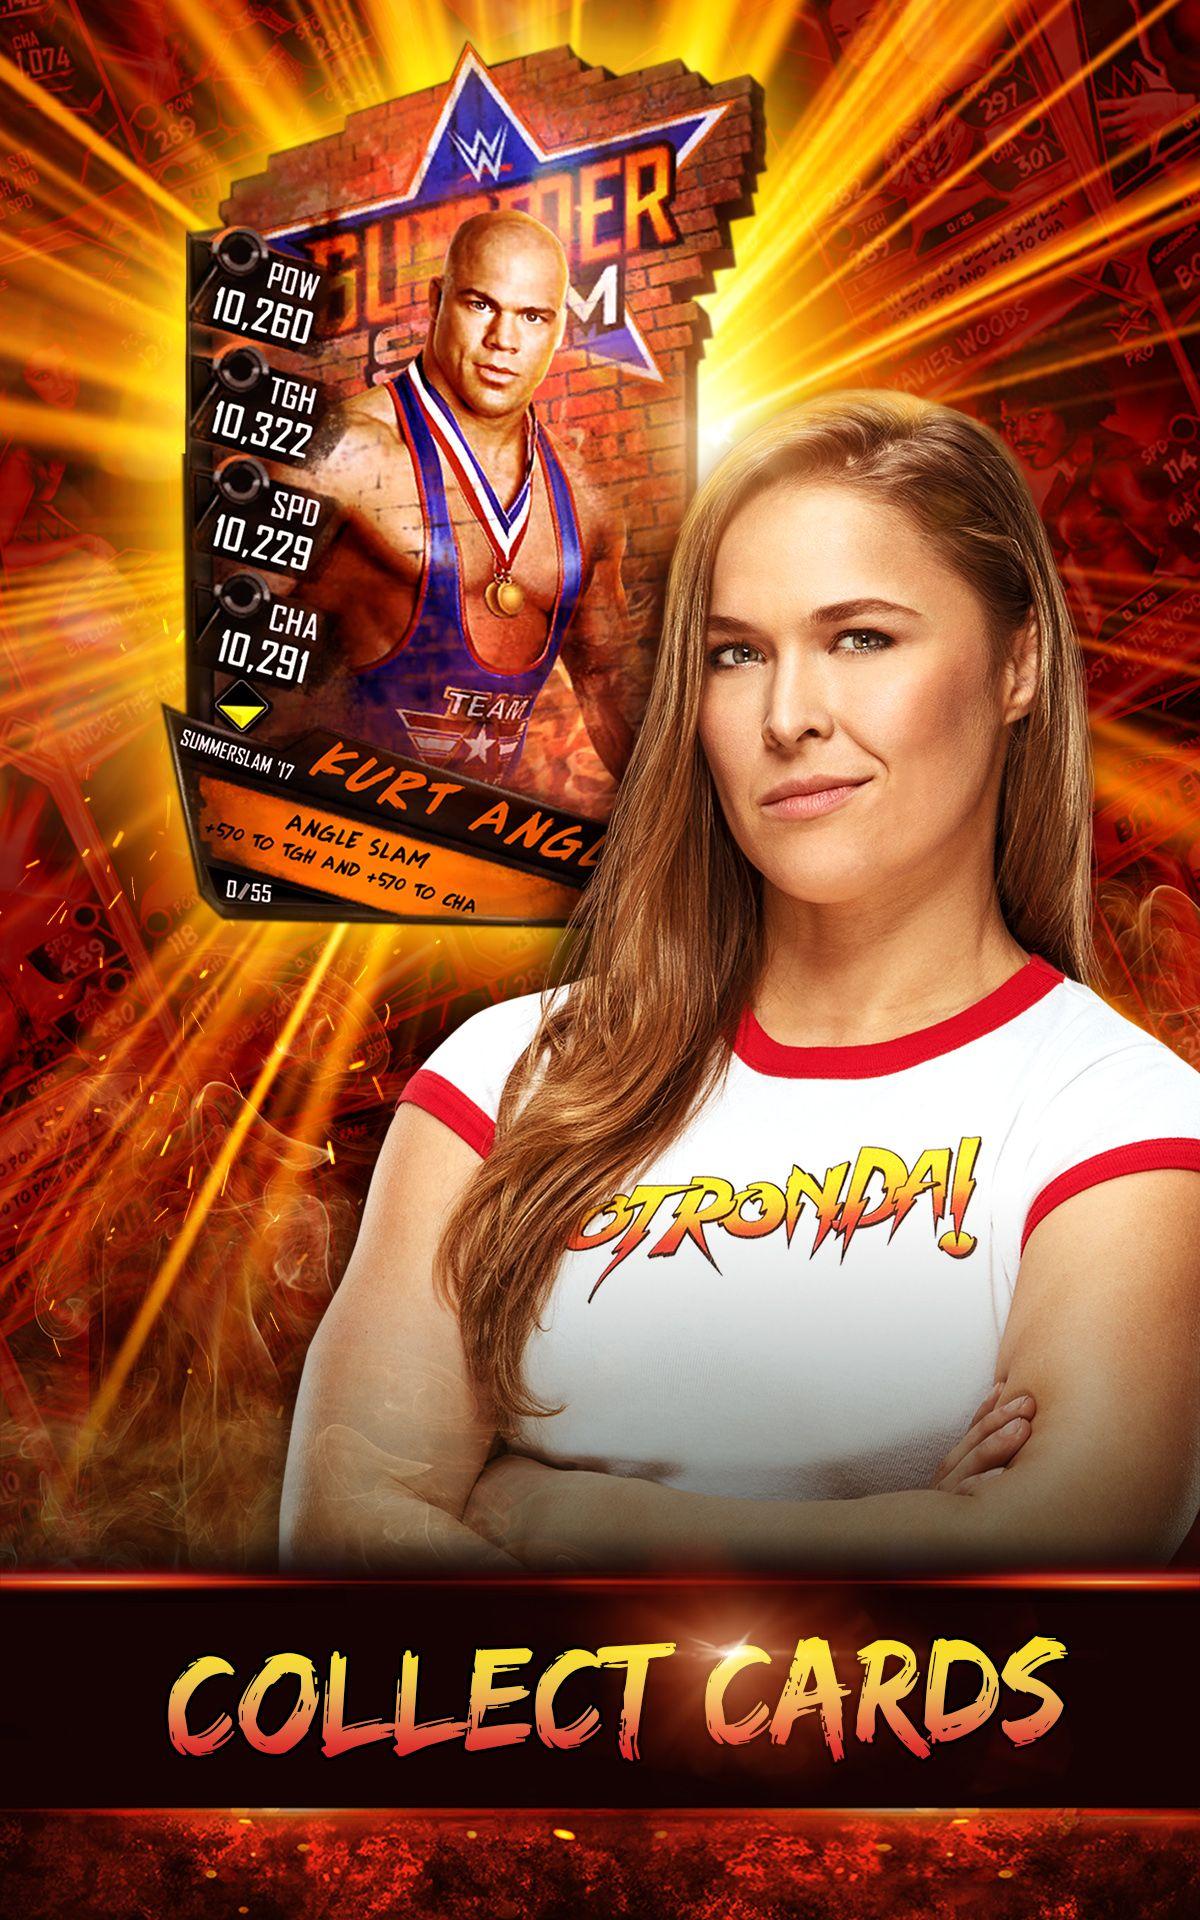 WWE SuperCard WWE, SuperCard Wwe, Game logo, Game app